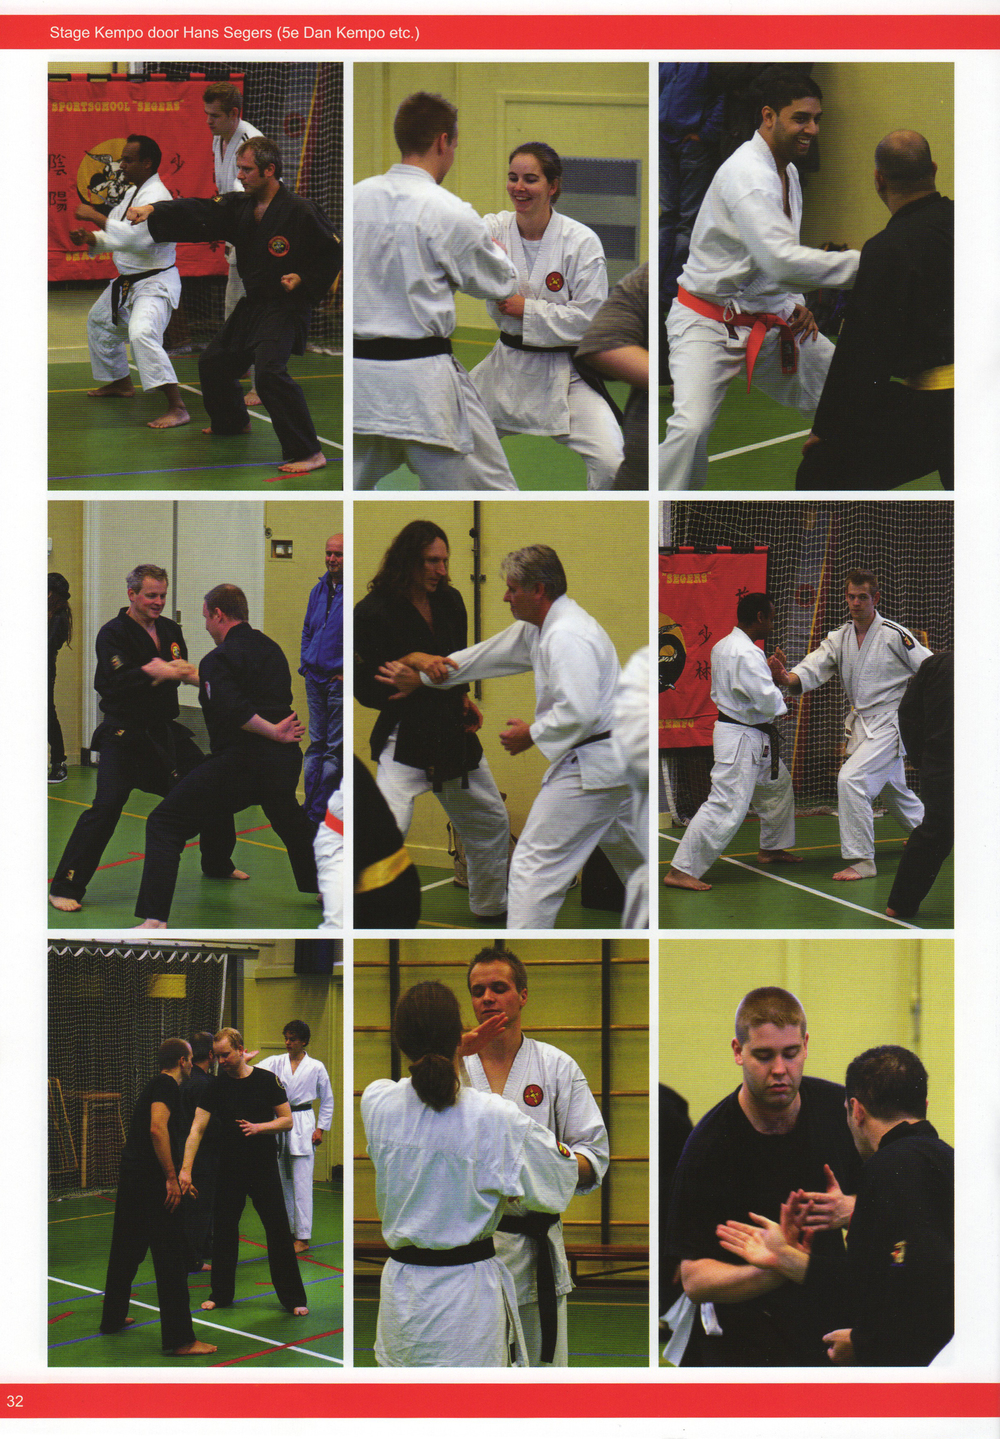 2012-11-04 NFK 7 Masters Martial Arts Festival Fotomagazine 2012 Pagina 32.jpg